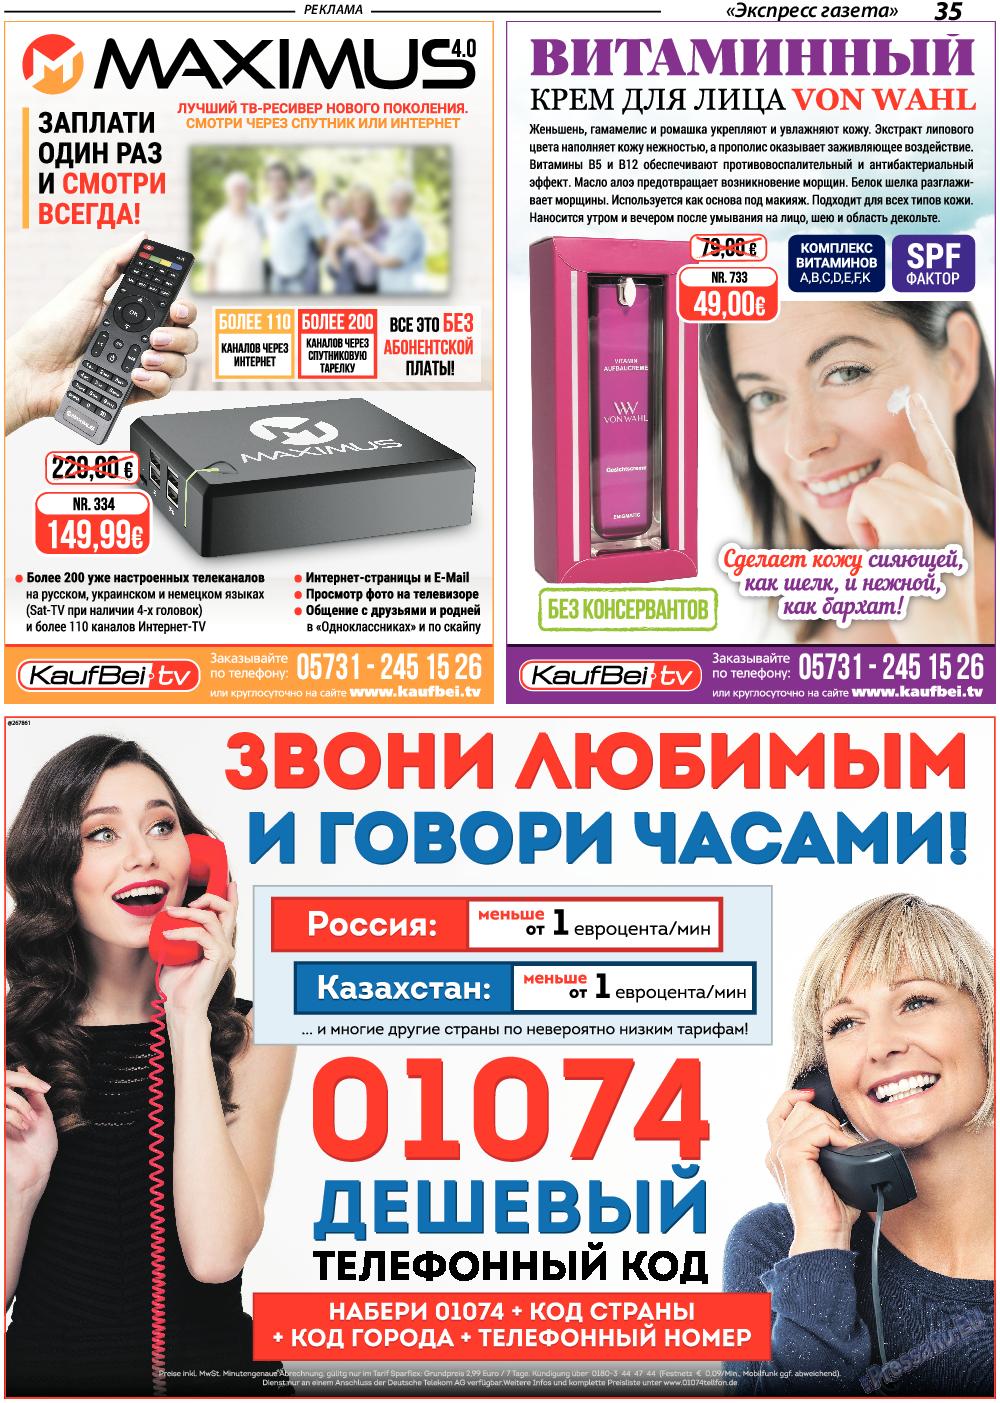 Экспресс газета (газета). 2018 год, номер 10, стр. 35